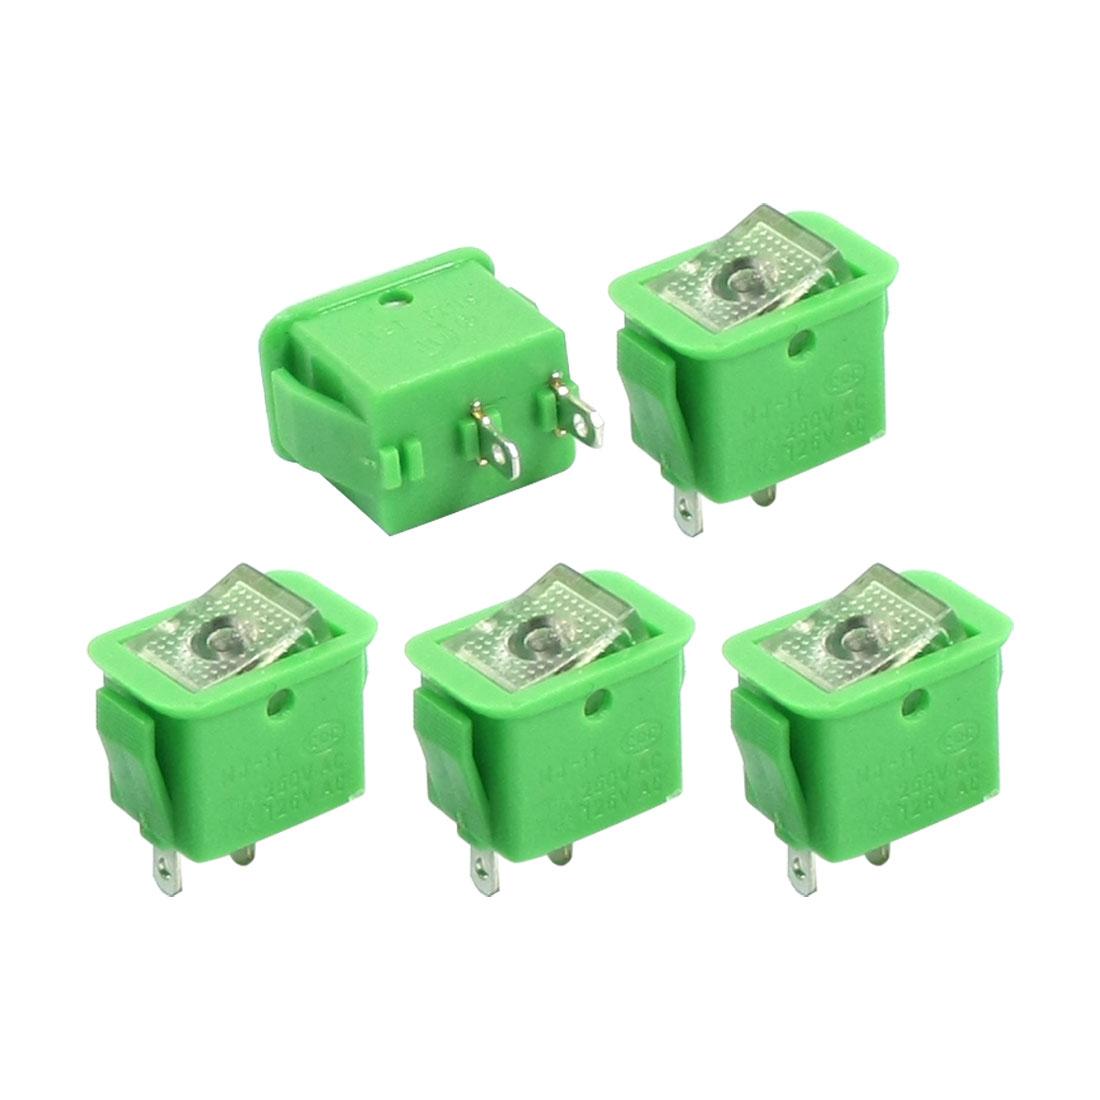 5PCS SPST 2 Position Locking Panel Mount Clear Button Green Rocker Switch